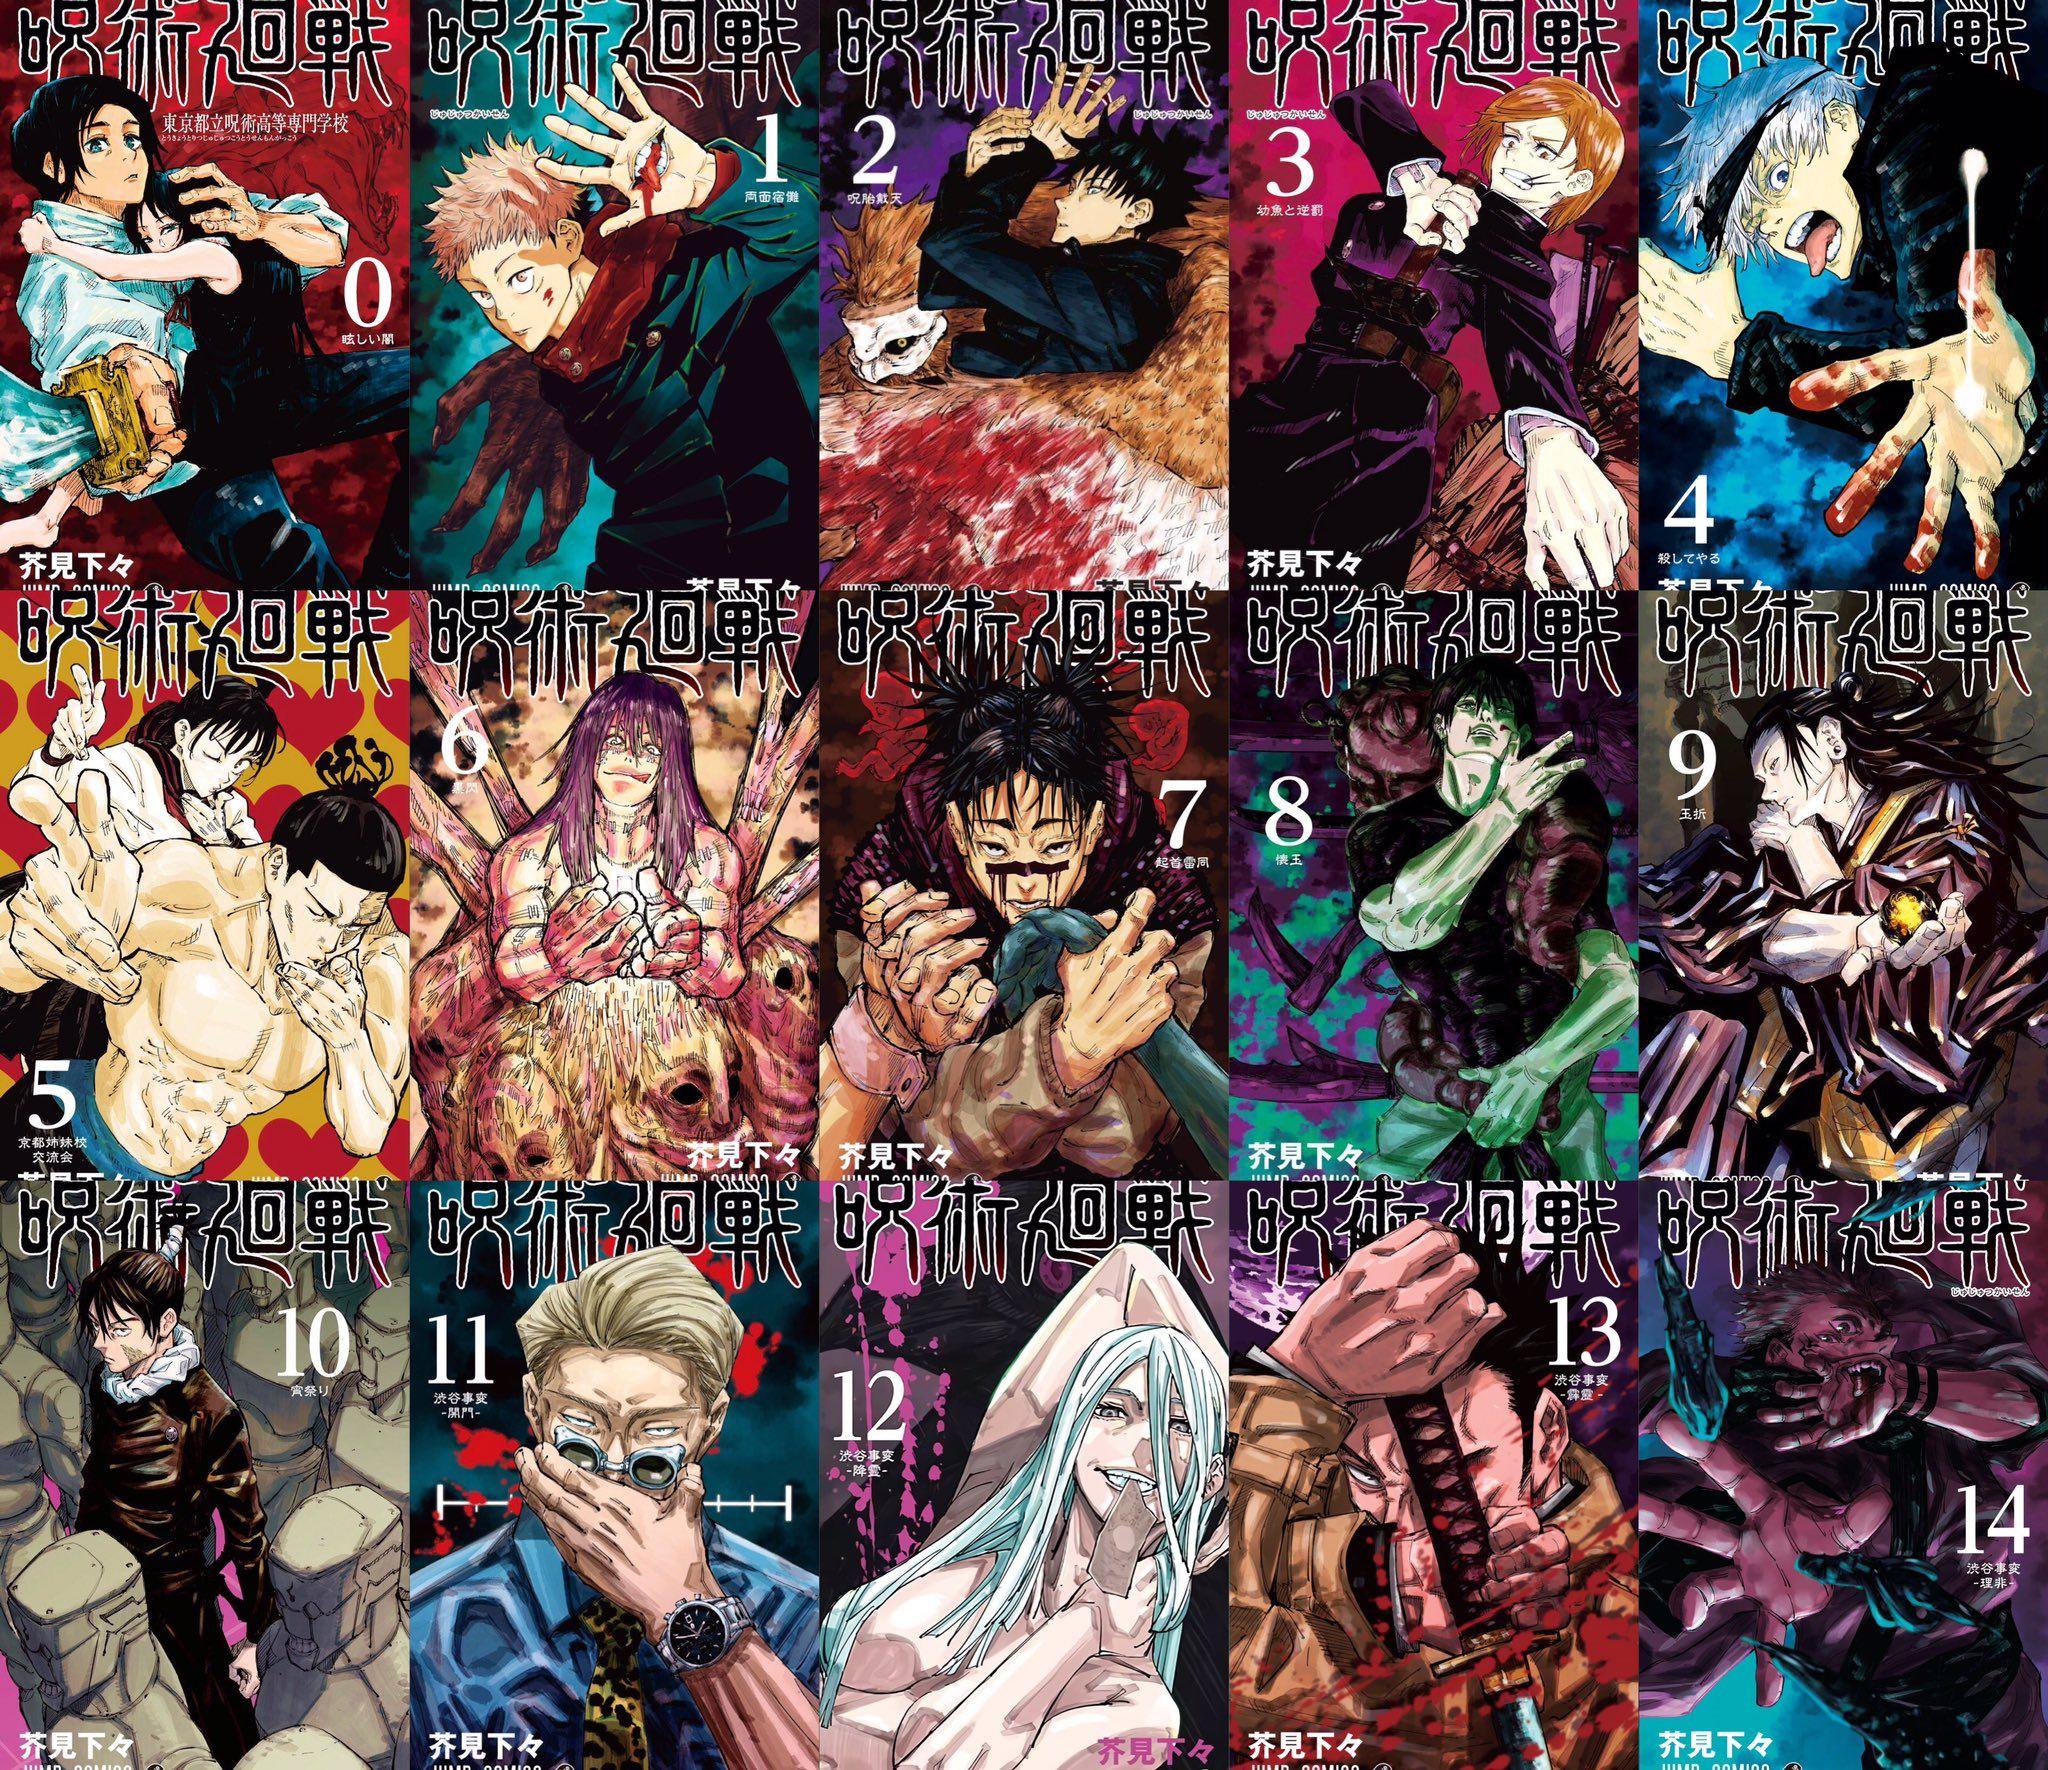 Jujutsu Kaisen On Twitter In 2021 Jujutsu Manga Covers Aesthetic Anime